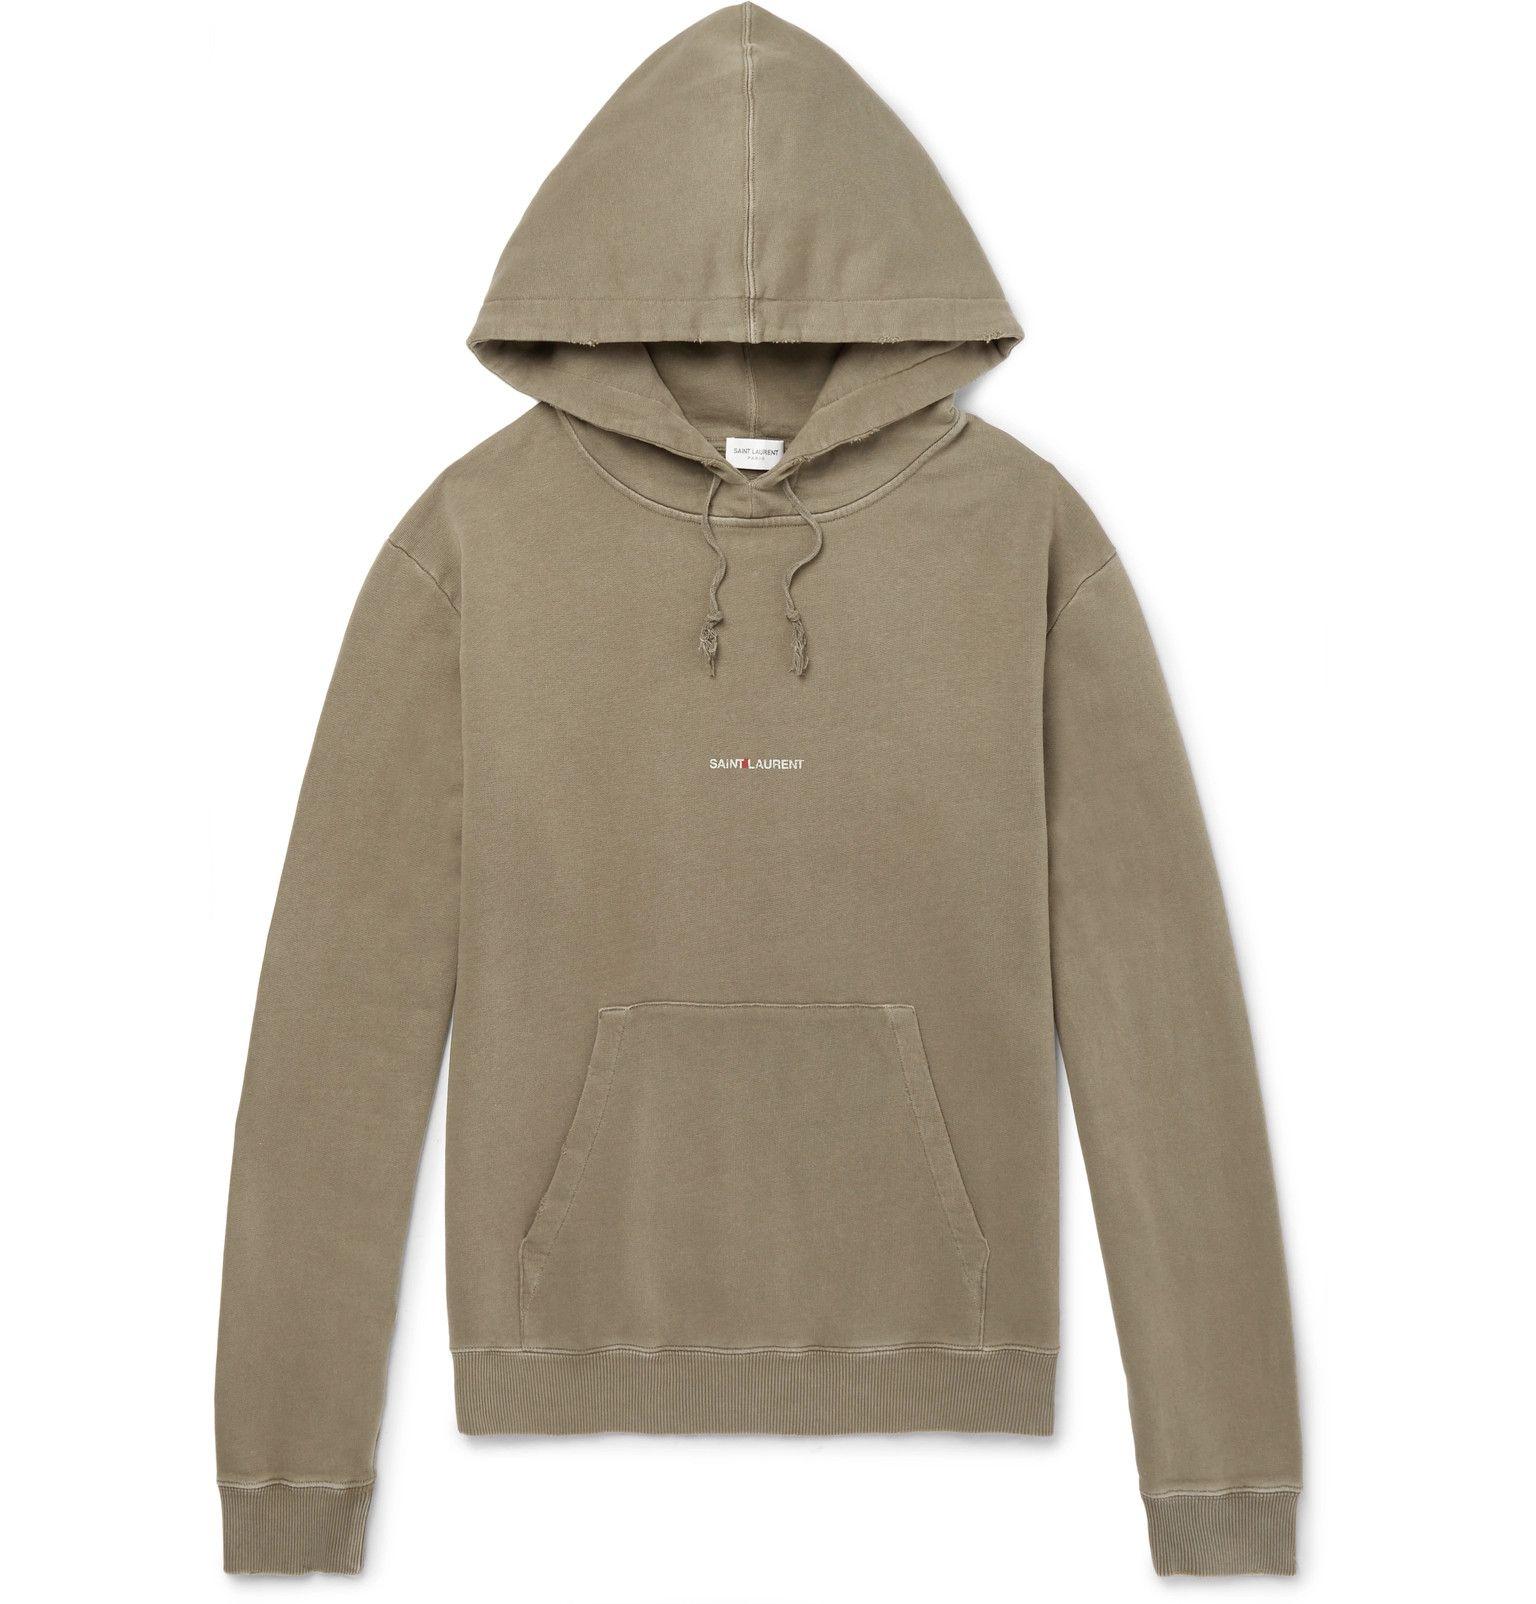 127d3427cb9 Saint Laurent Logo-Print Distressed Loopback Cotton-Jersey Hoodie |  Products | Mens designer hoodies, Hoodies, Cotton